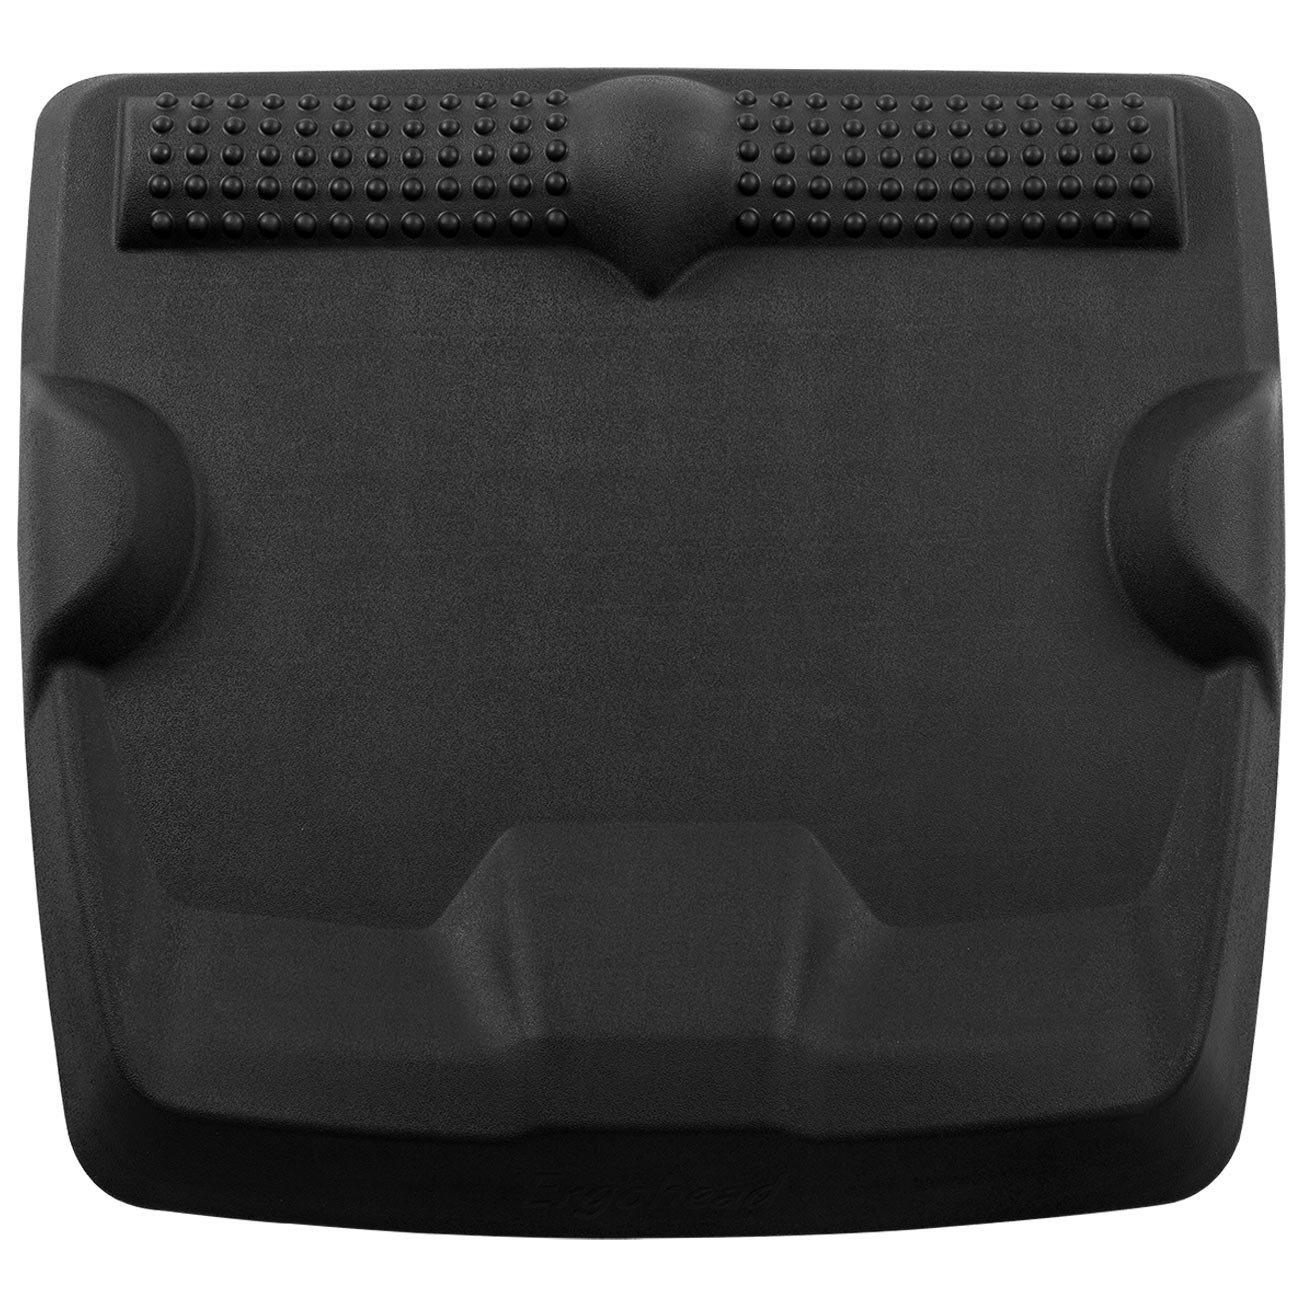 Ergohead Standing Desk Mat - Not-Flat Anti Fatigue Mat For Stand Up Desk, Ergonomically Engineered, Black by Ergohead